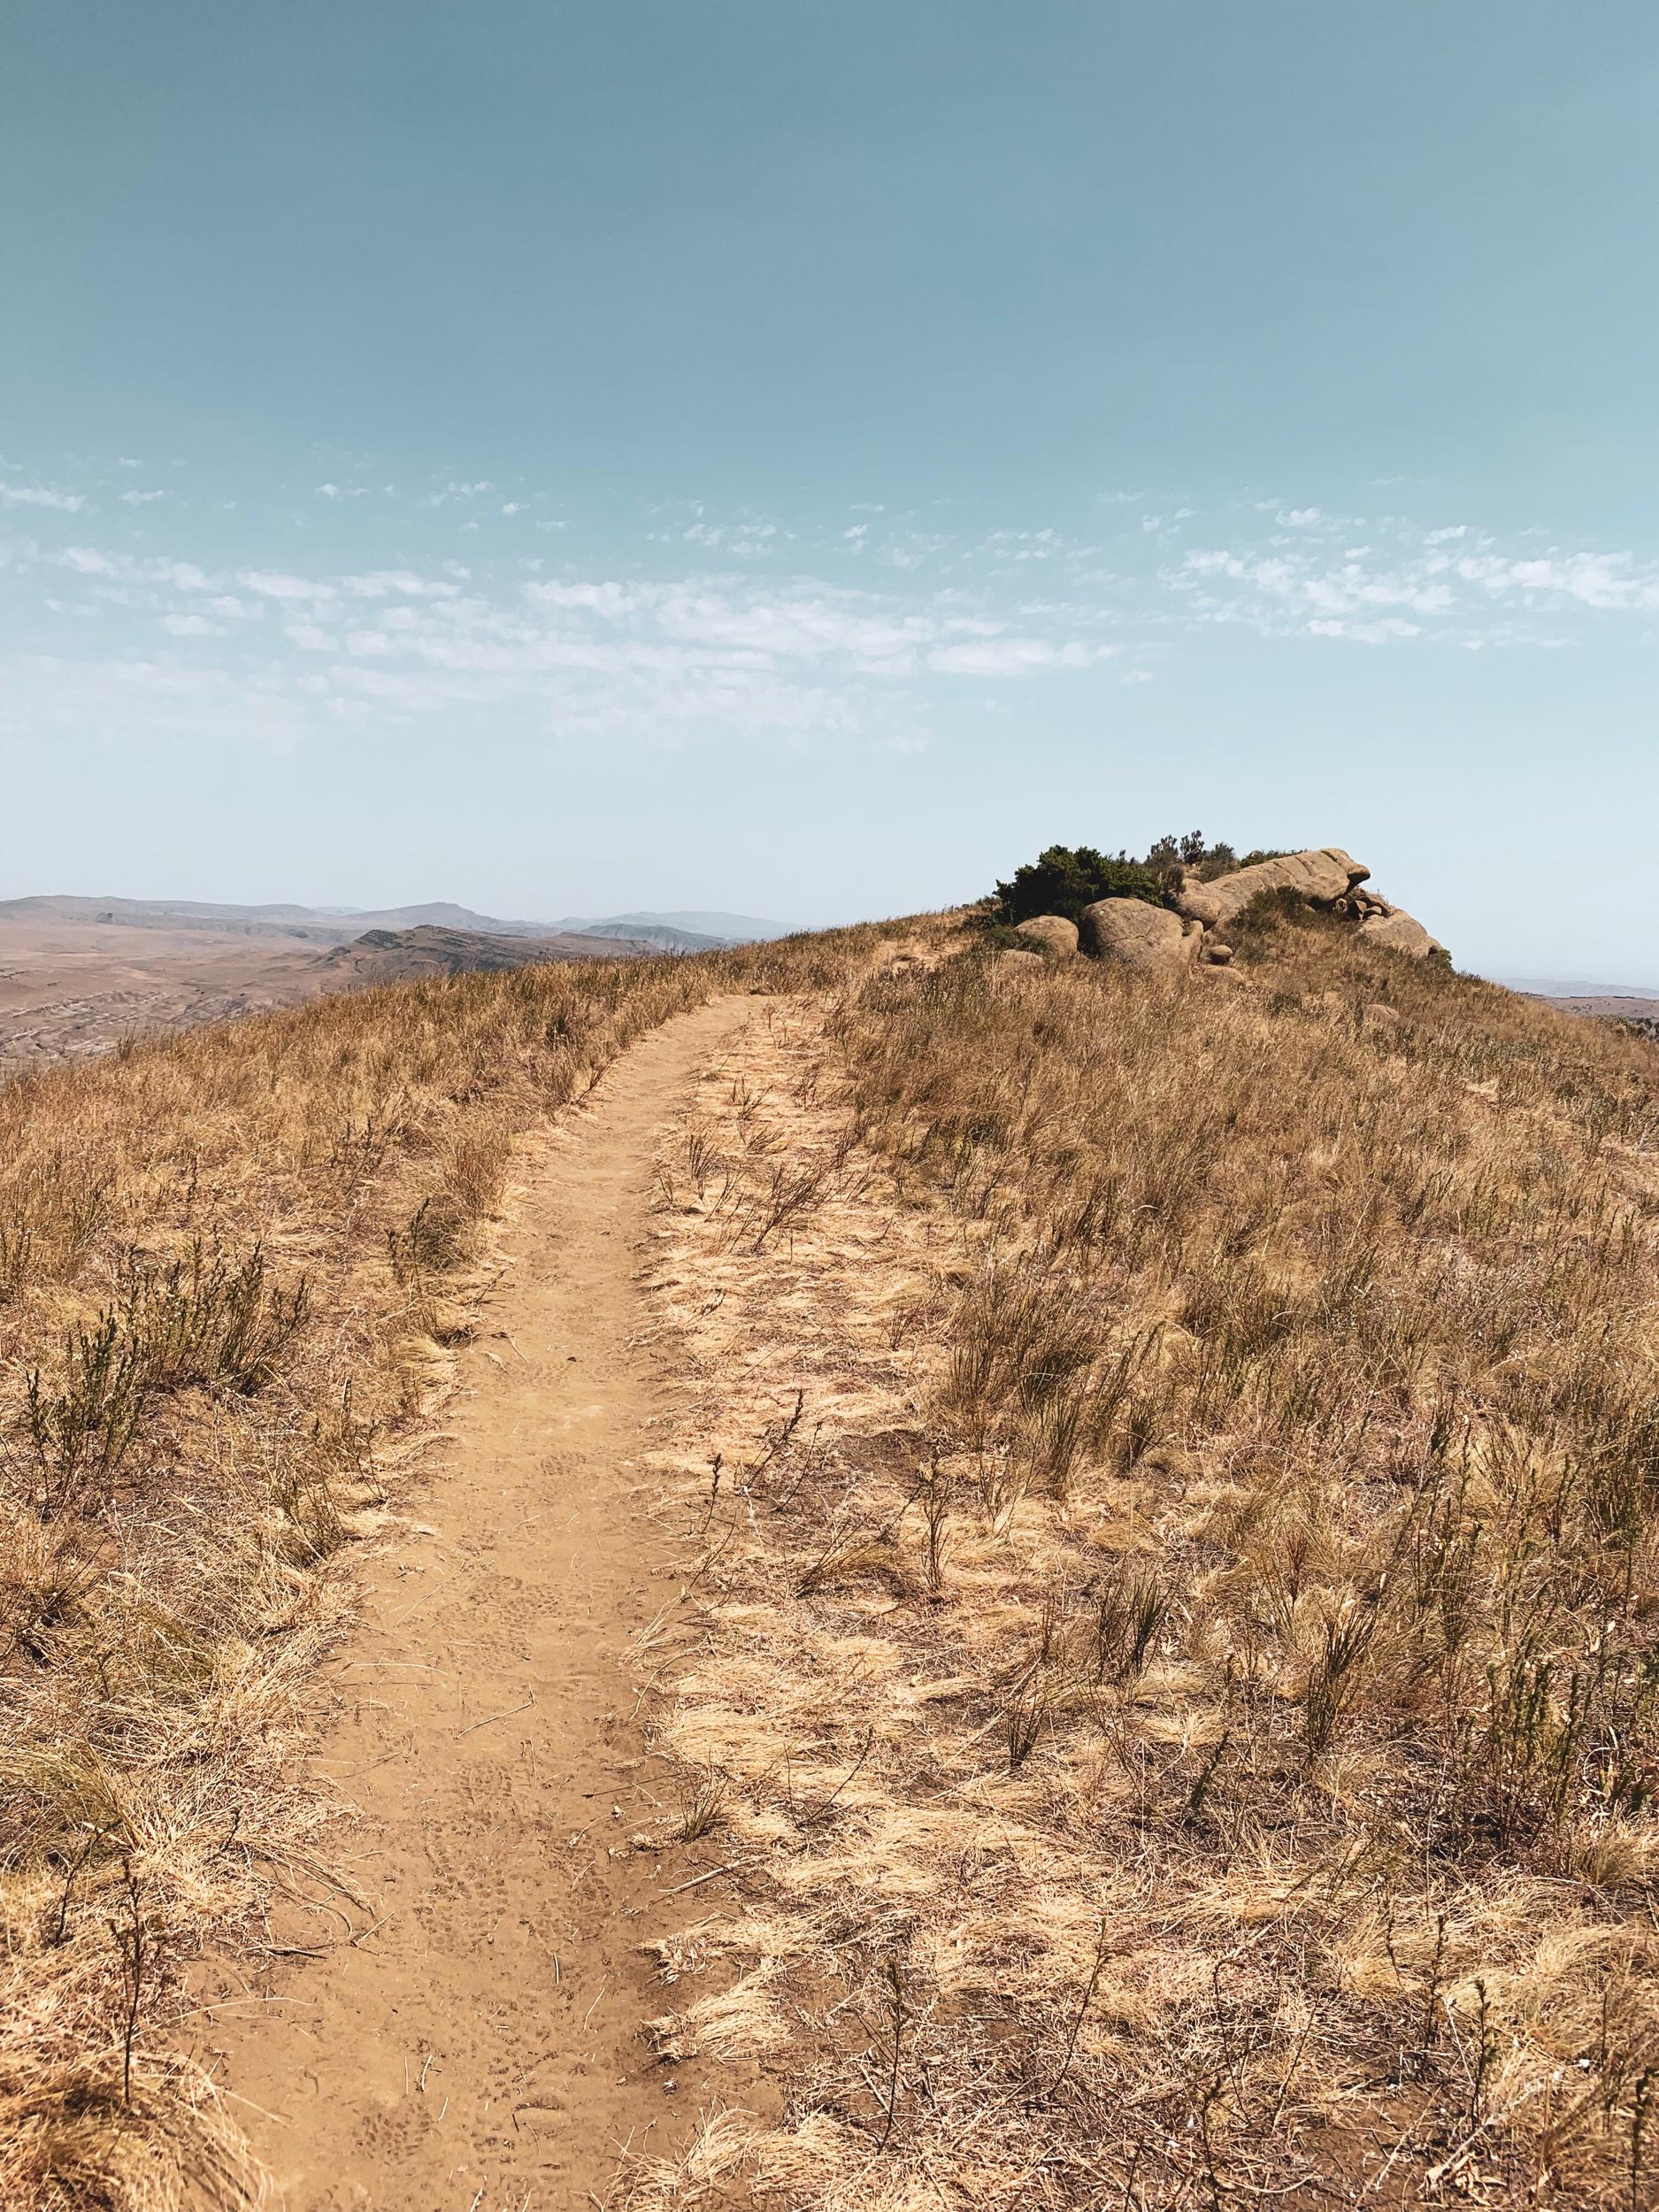 This hiking trail marks the border of Azerbaijan and Georgia